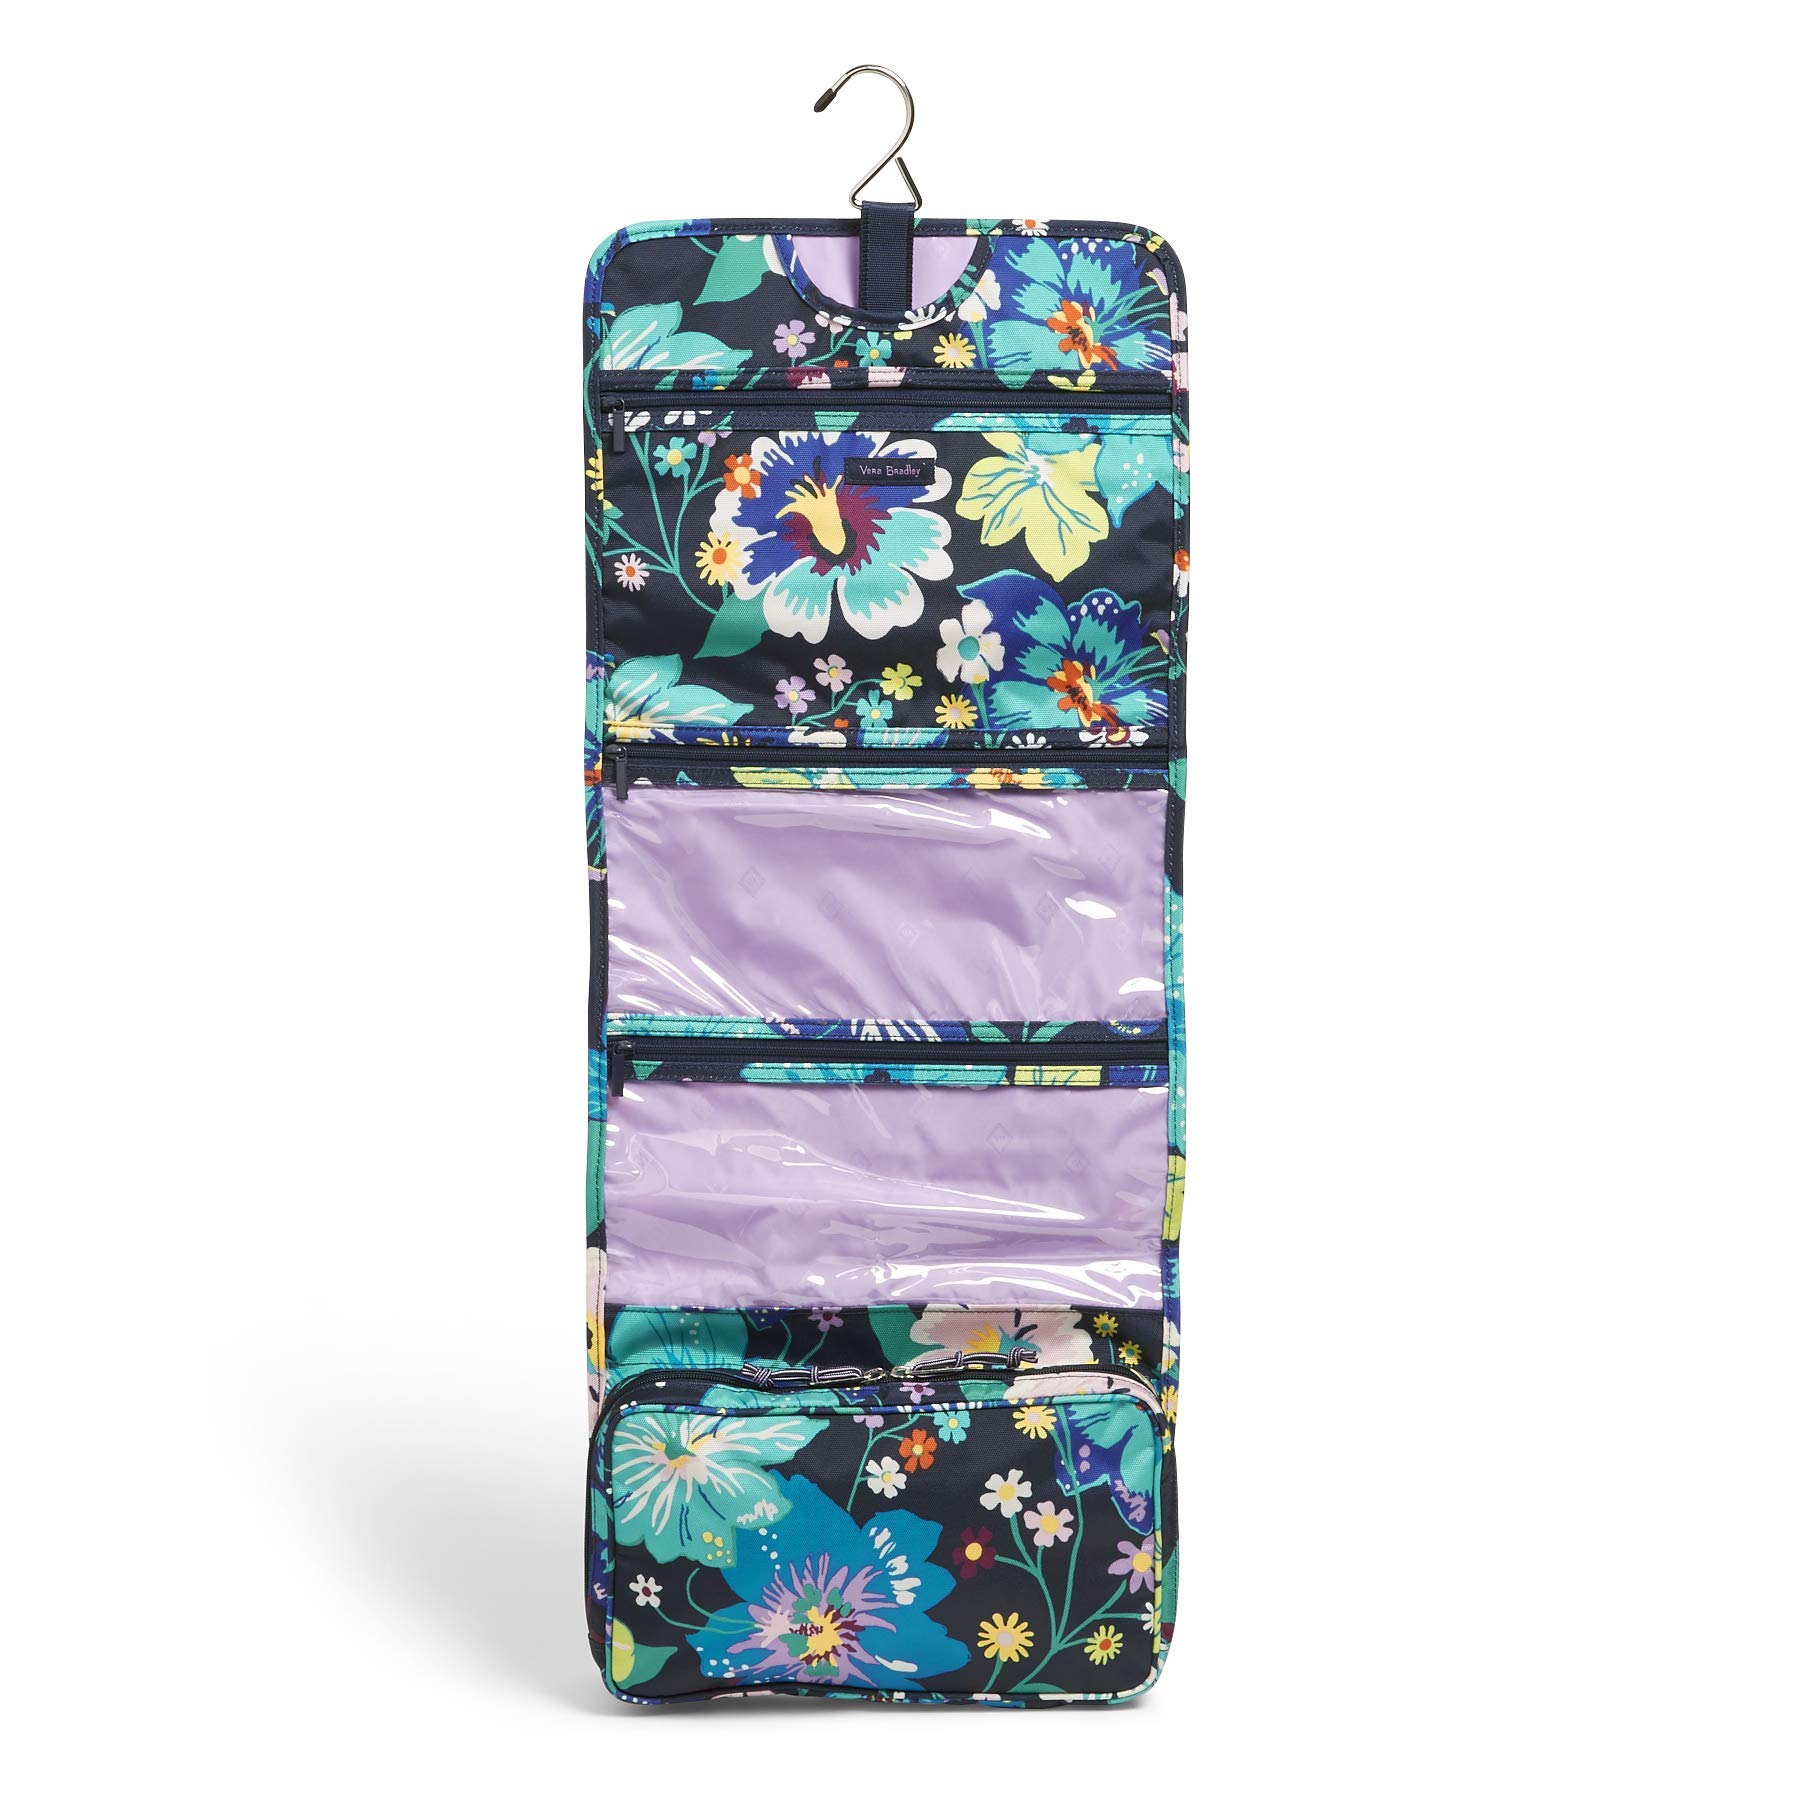 Vera Bradley Lighten Up Hanging Travel Organizer, Polyester, Firefly Garden by Vera Bradley